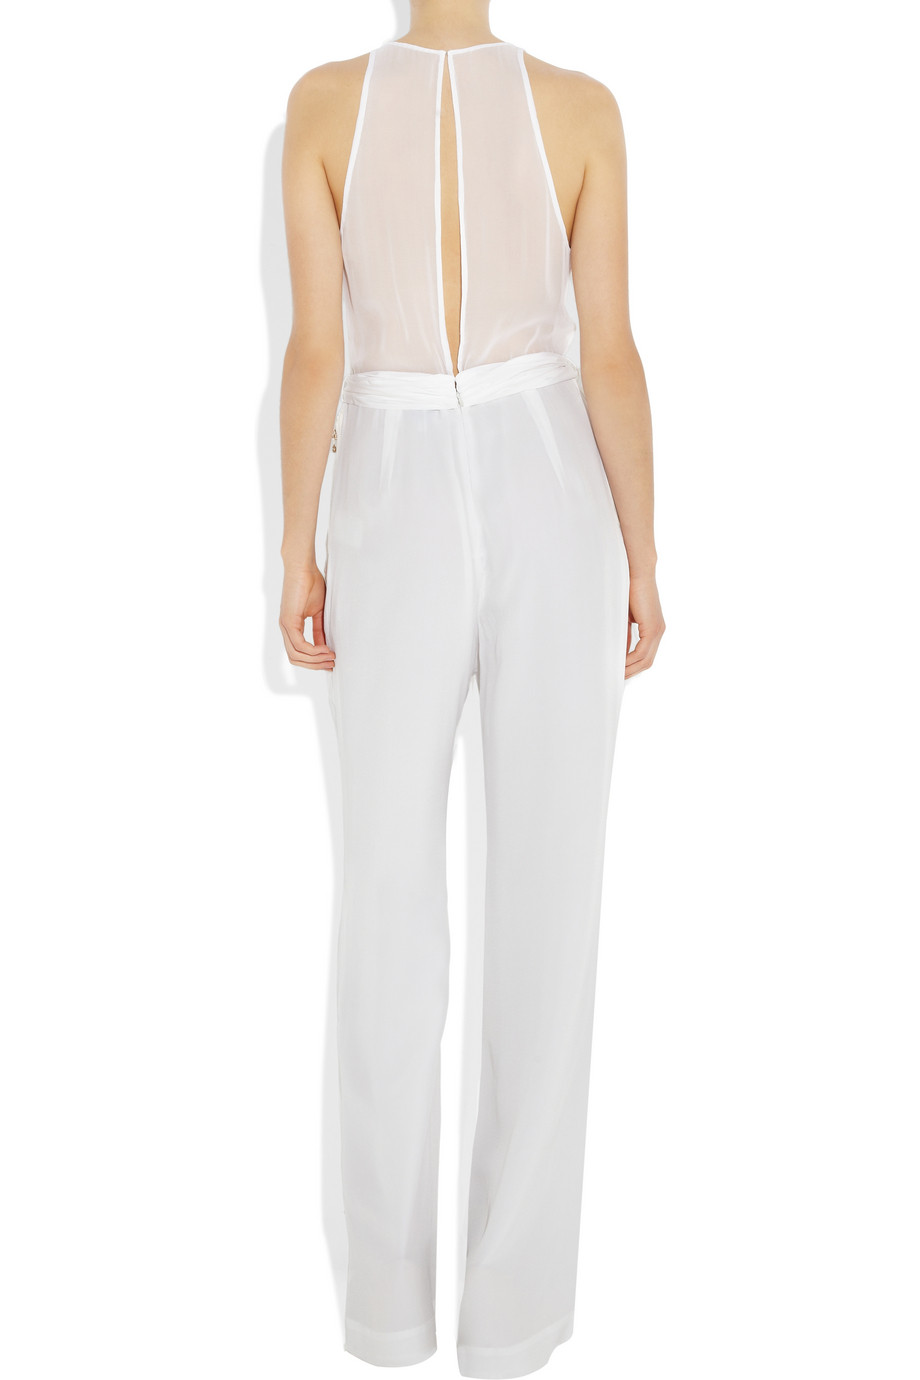 3 1 phillip lim silk crepe jumpsuit in white lyst for Hochzeit jumpsuit